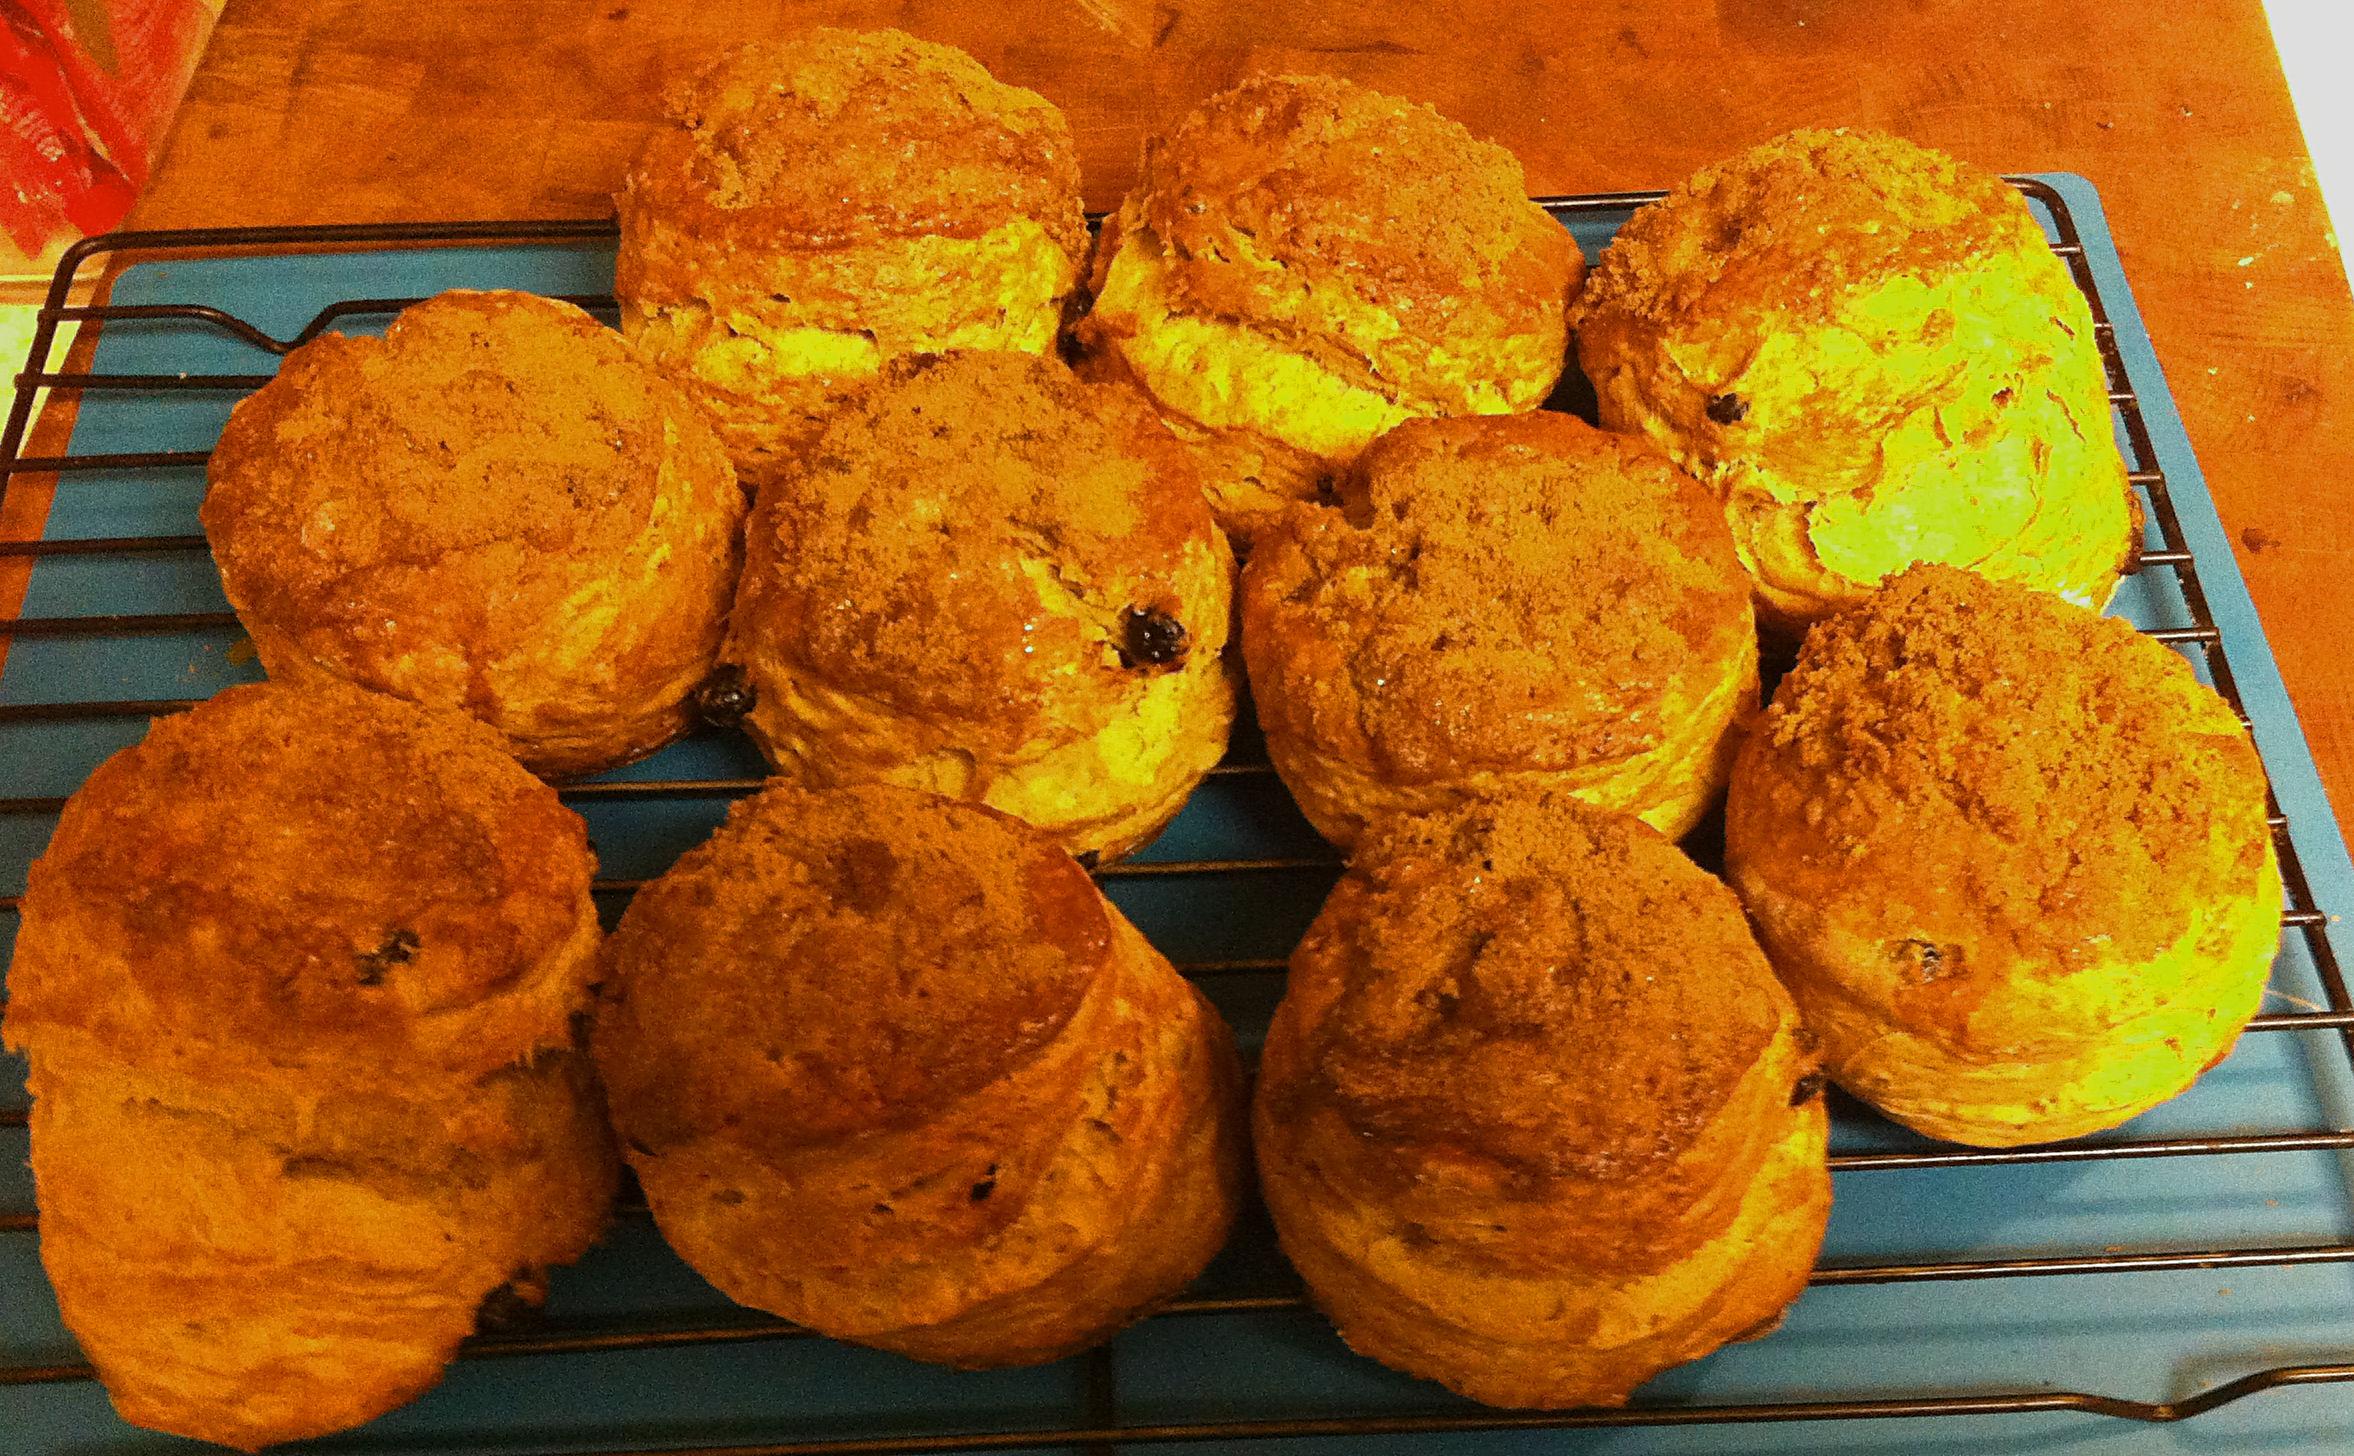 Karl S Blueberry Cinnamon Biscuits Jabberwocky Stew